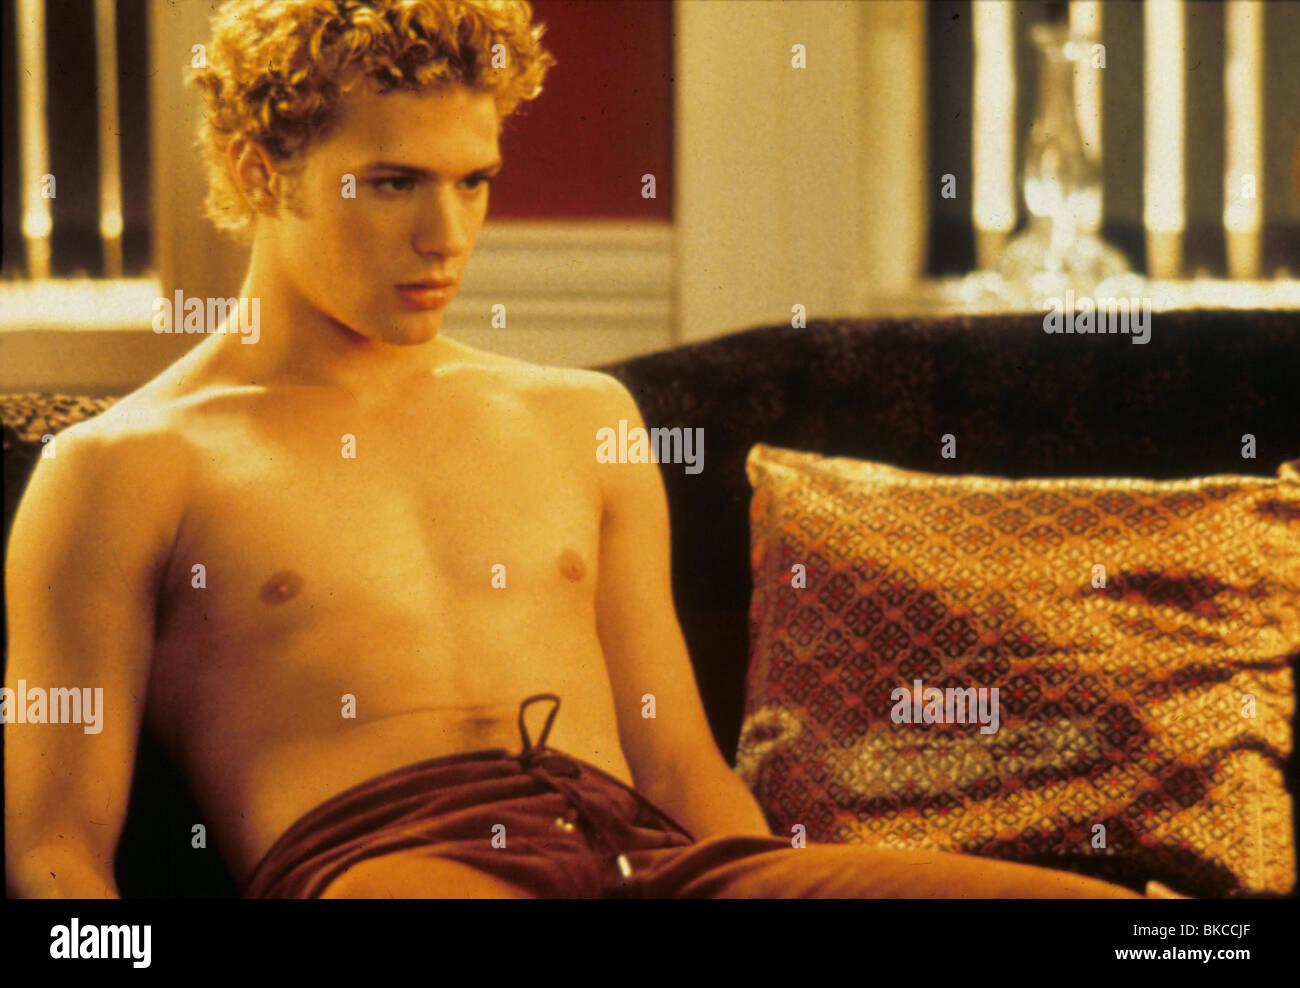 54 -1998 RYAN PHILLIPPE - Stock Image